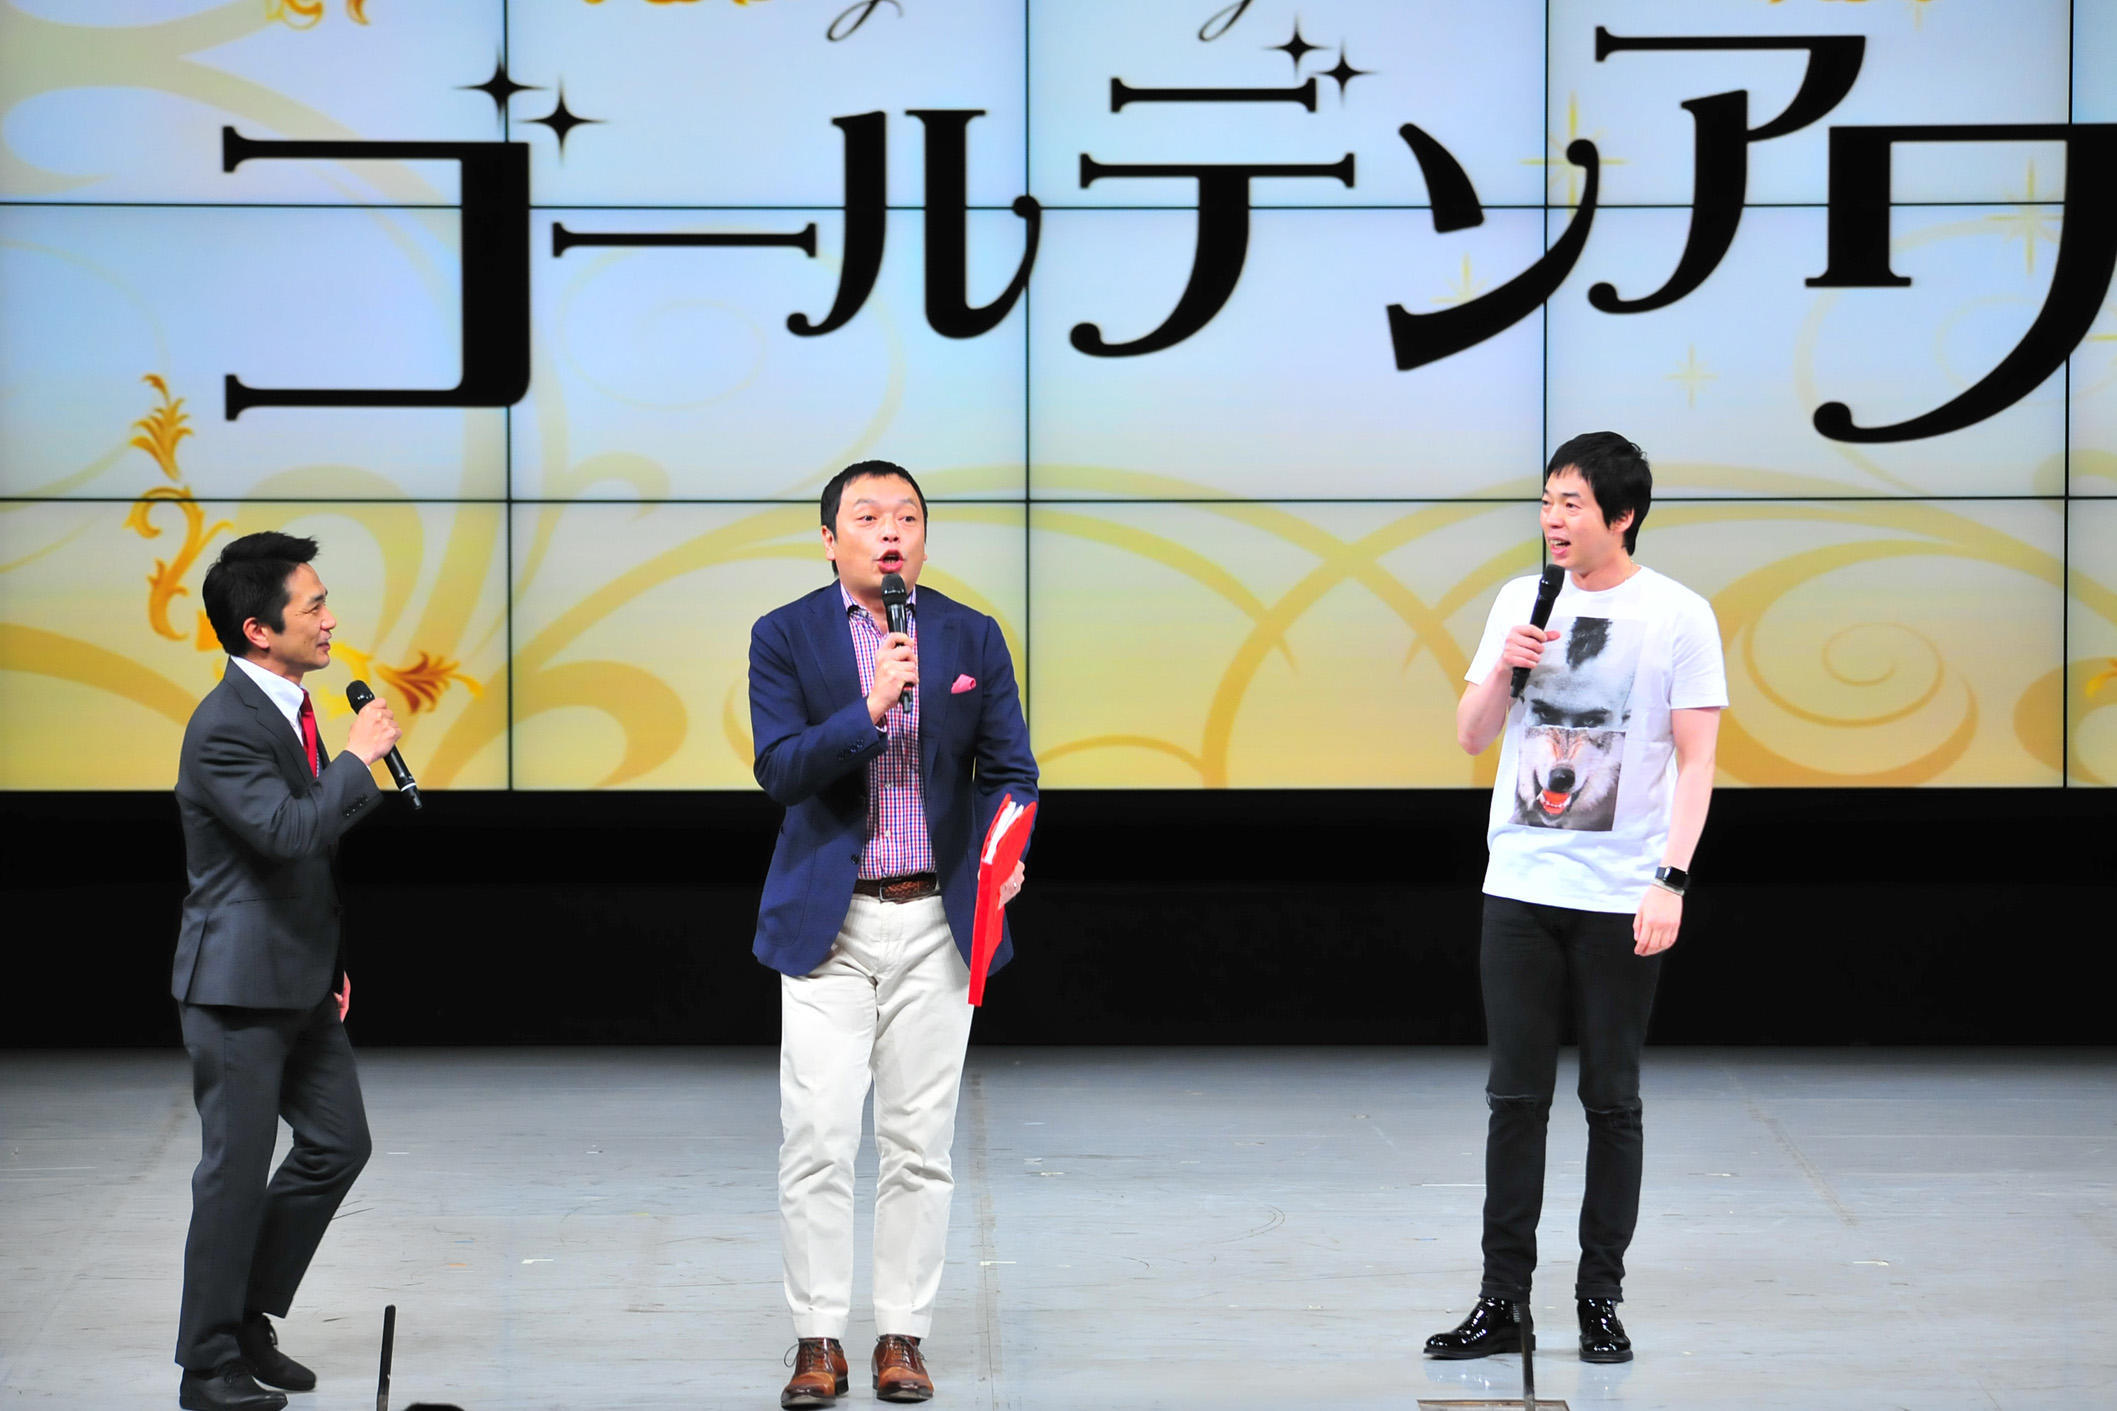 http://news.yoshimoto.co.jp/20160421124532-5031875b662674e51b9251c3d85f63470edb964f.jpg